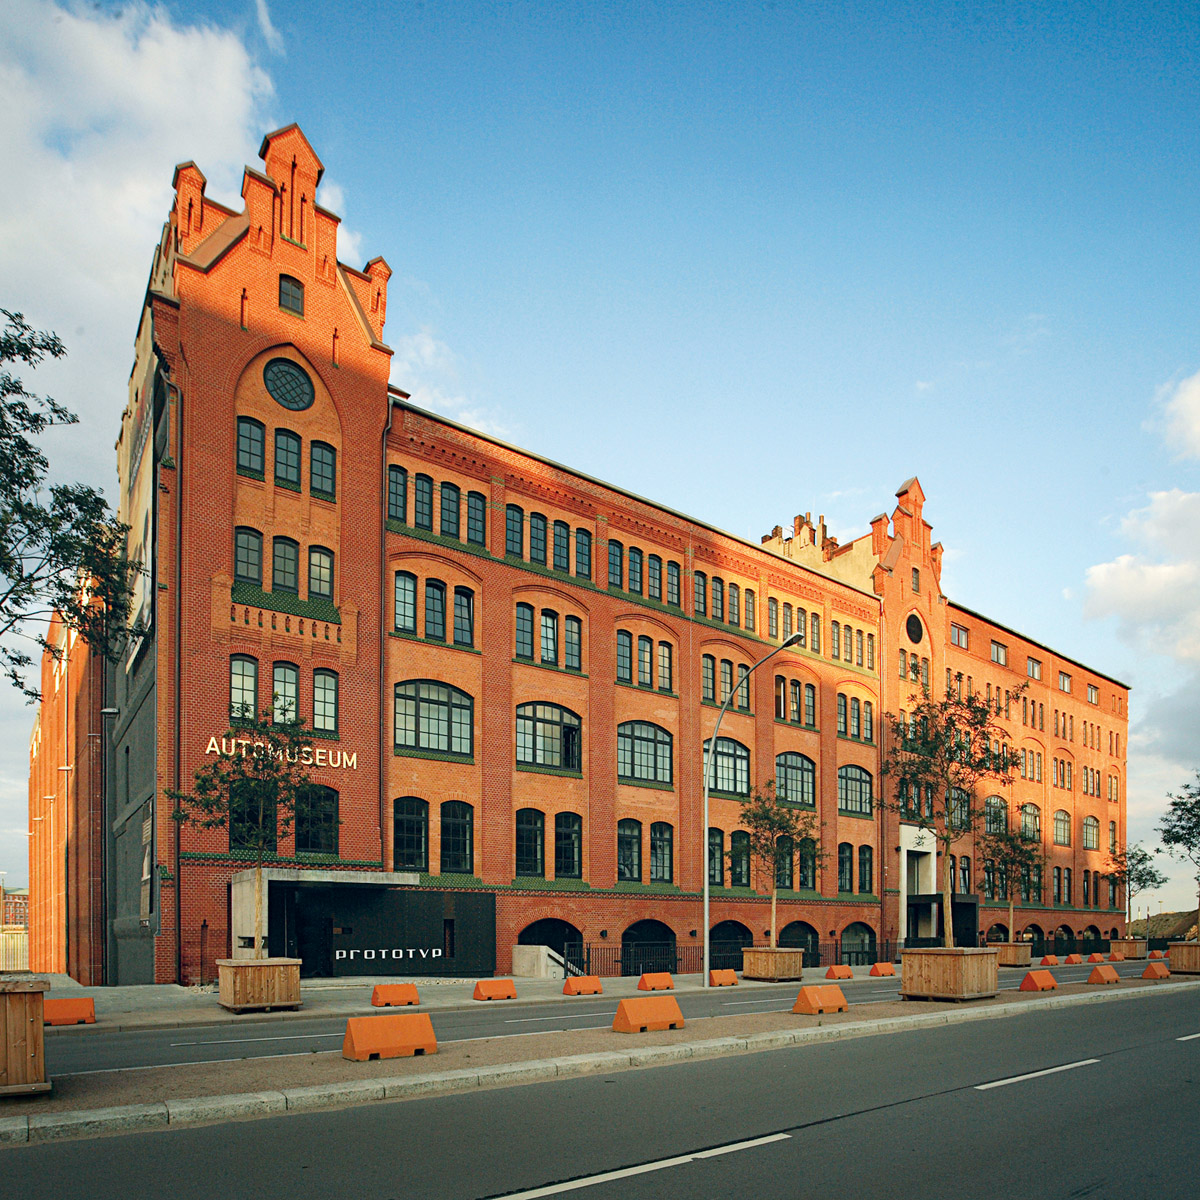 Das Automuseum Prototyp in Hamburg